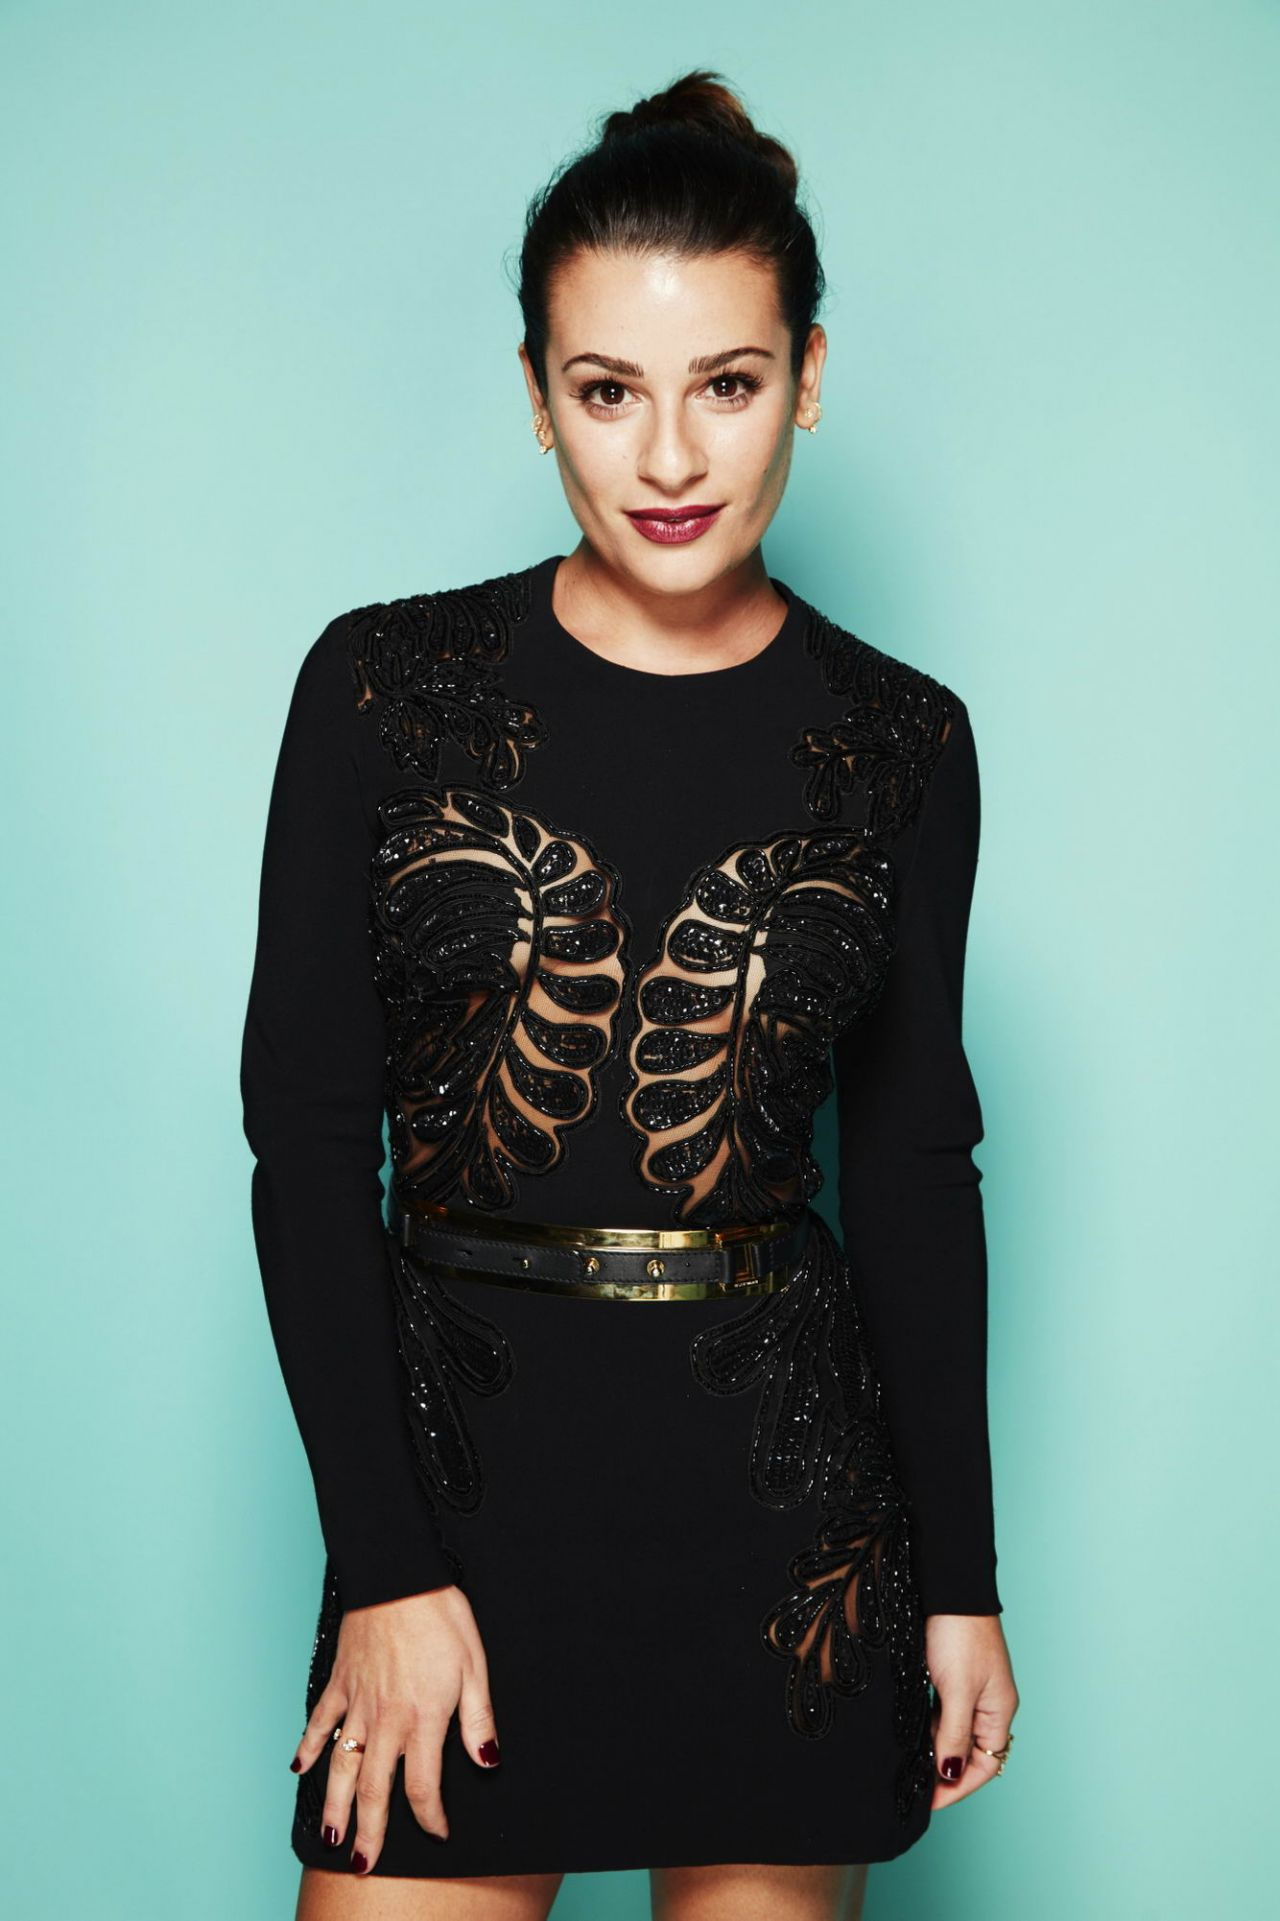 Lea Michele – People's Choice Awards 2016 Portrait Session